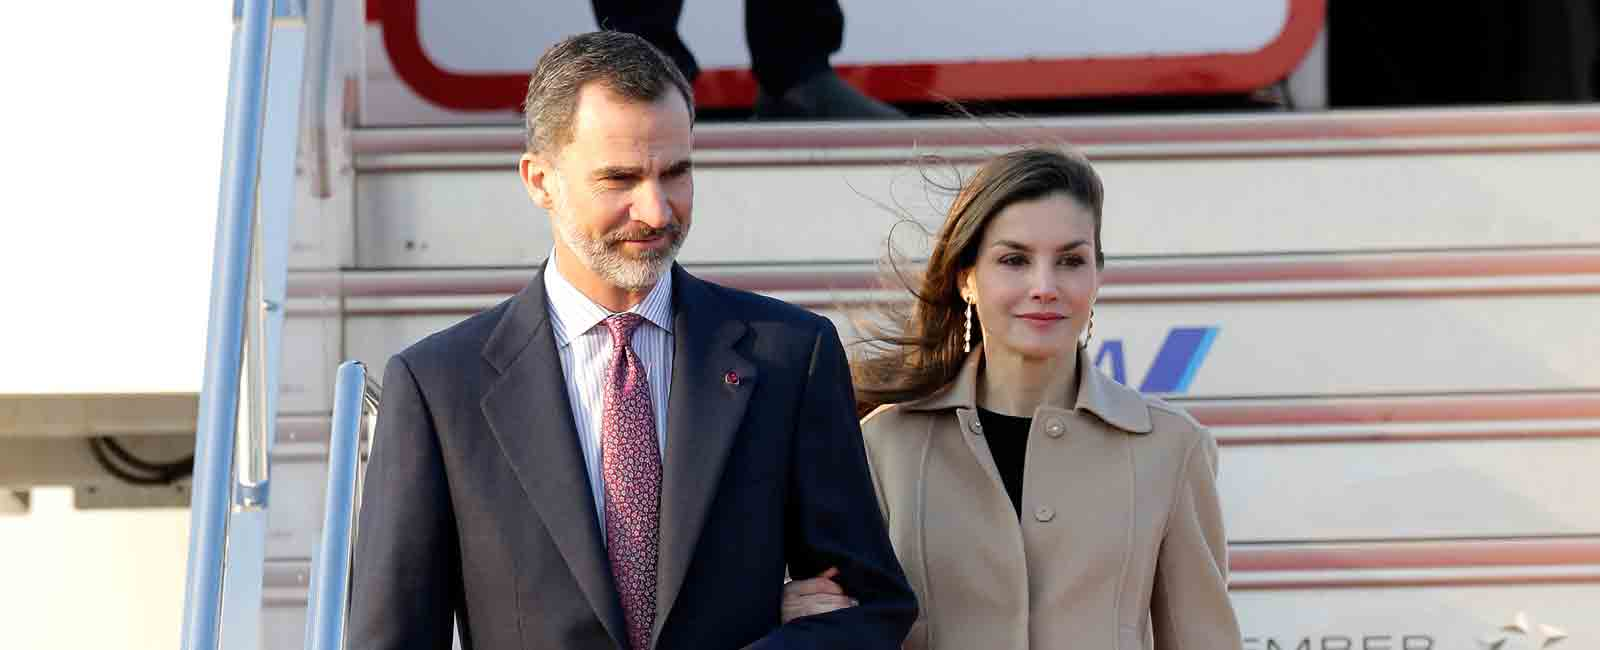 Don Felipe y doña Letizia, primer viaje a Japón como Reyes de España